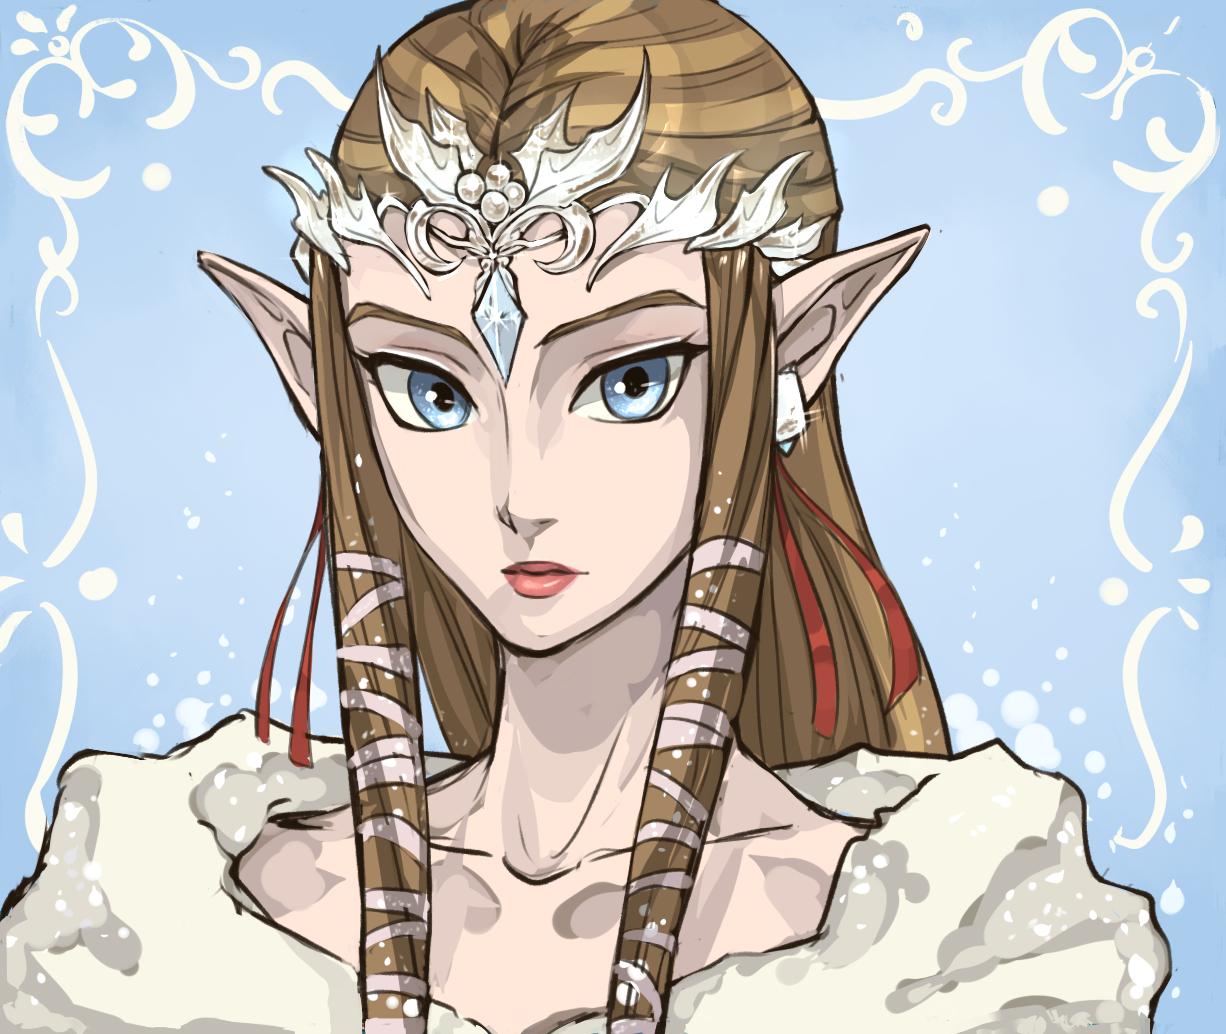 Zelda Twilight Princess Zelda No Densetsu Twilight